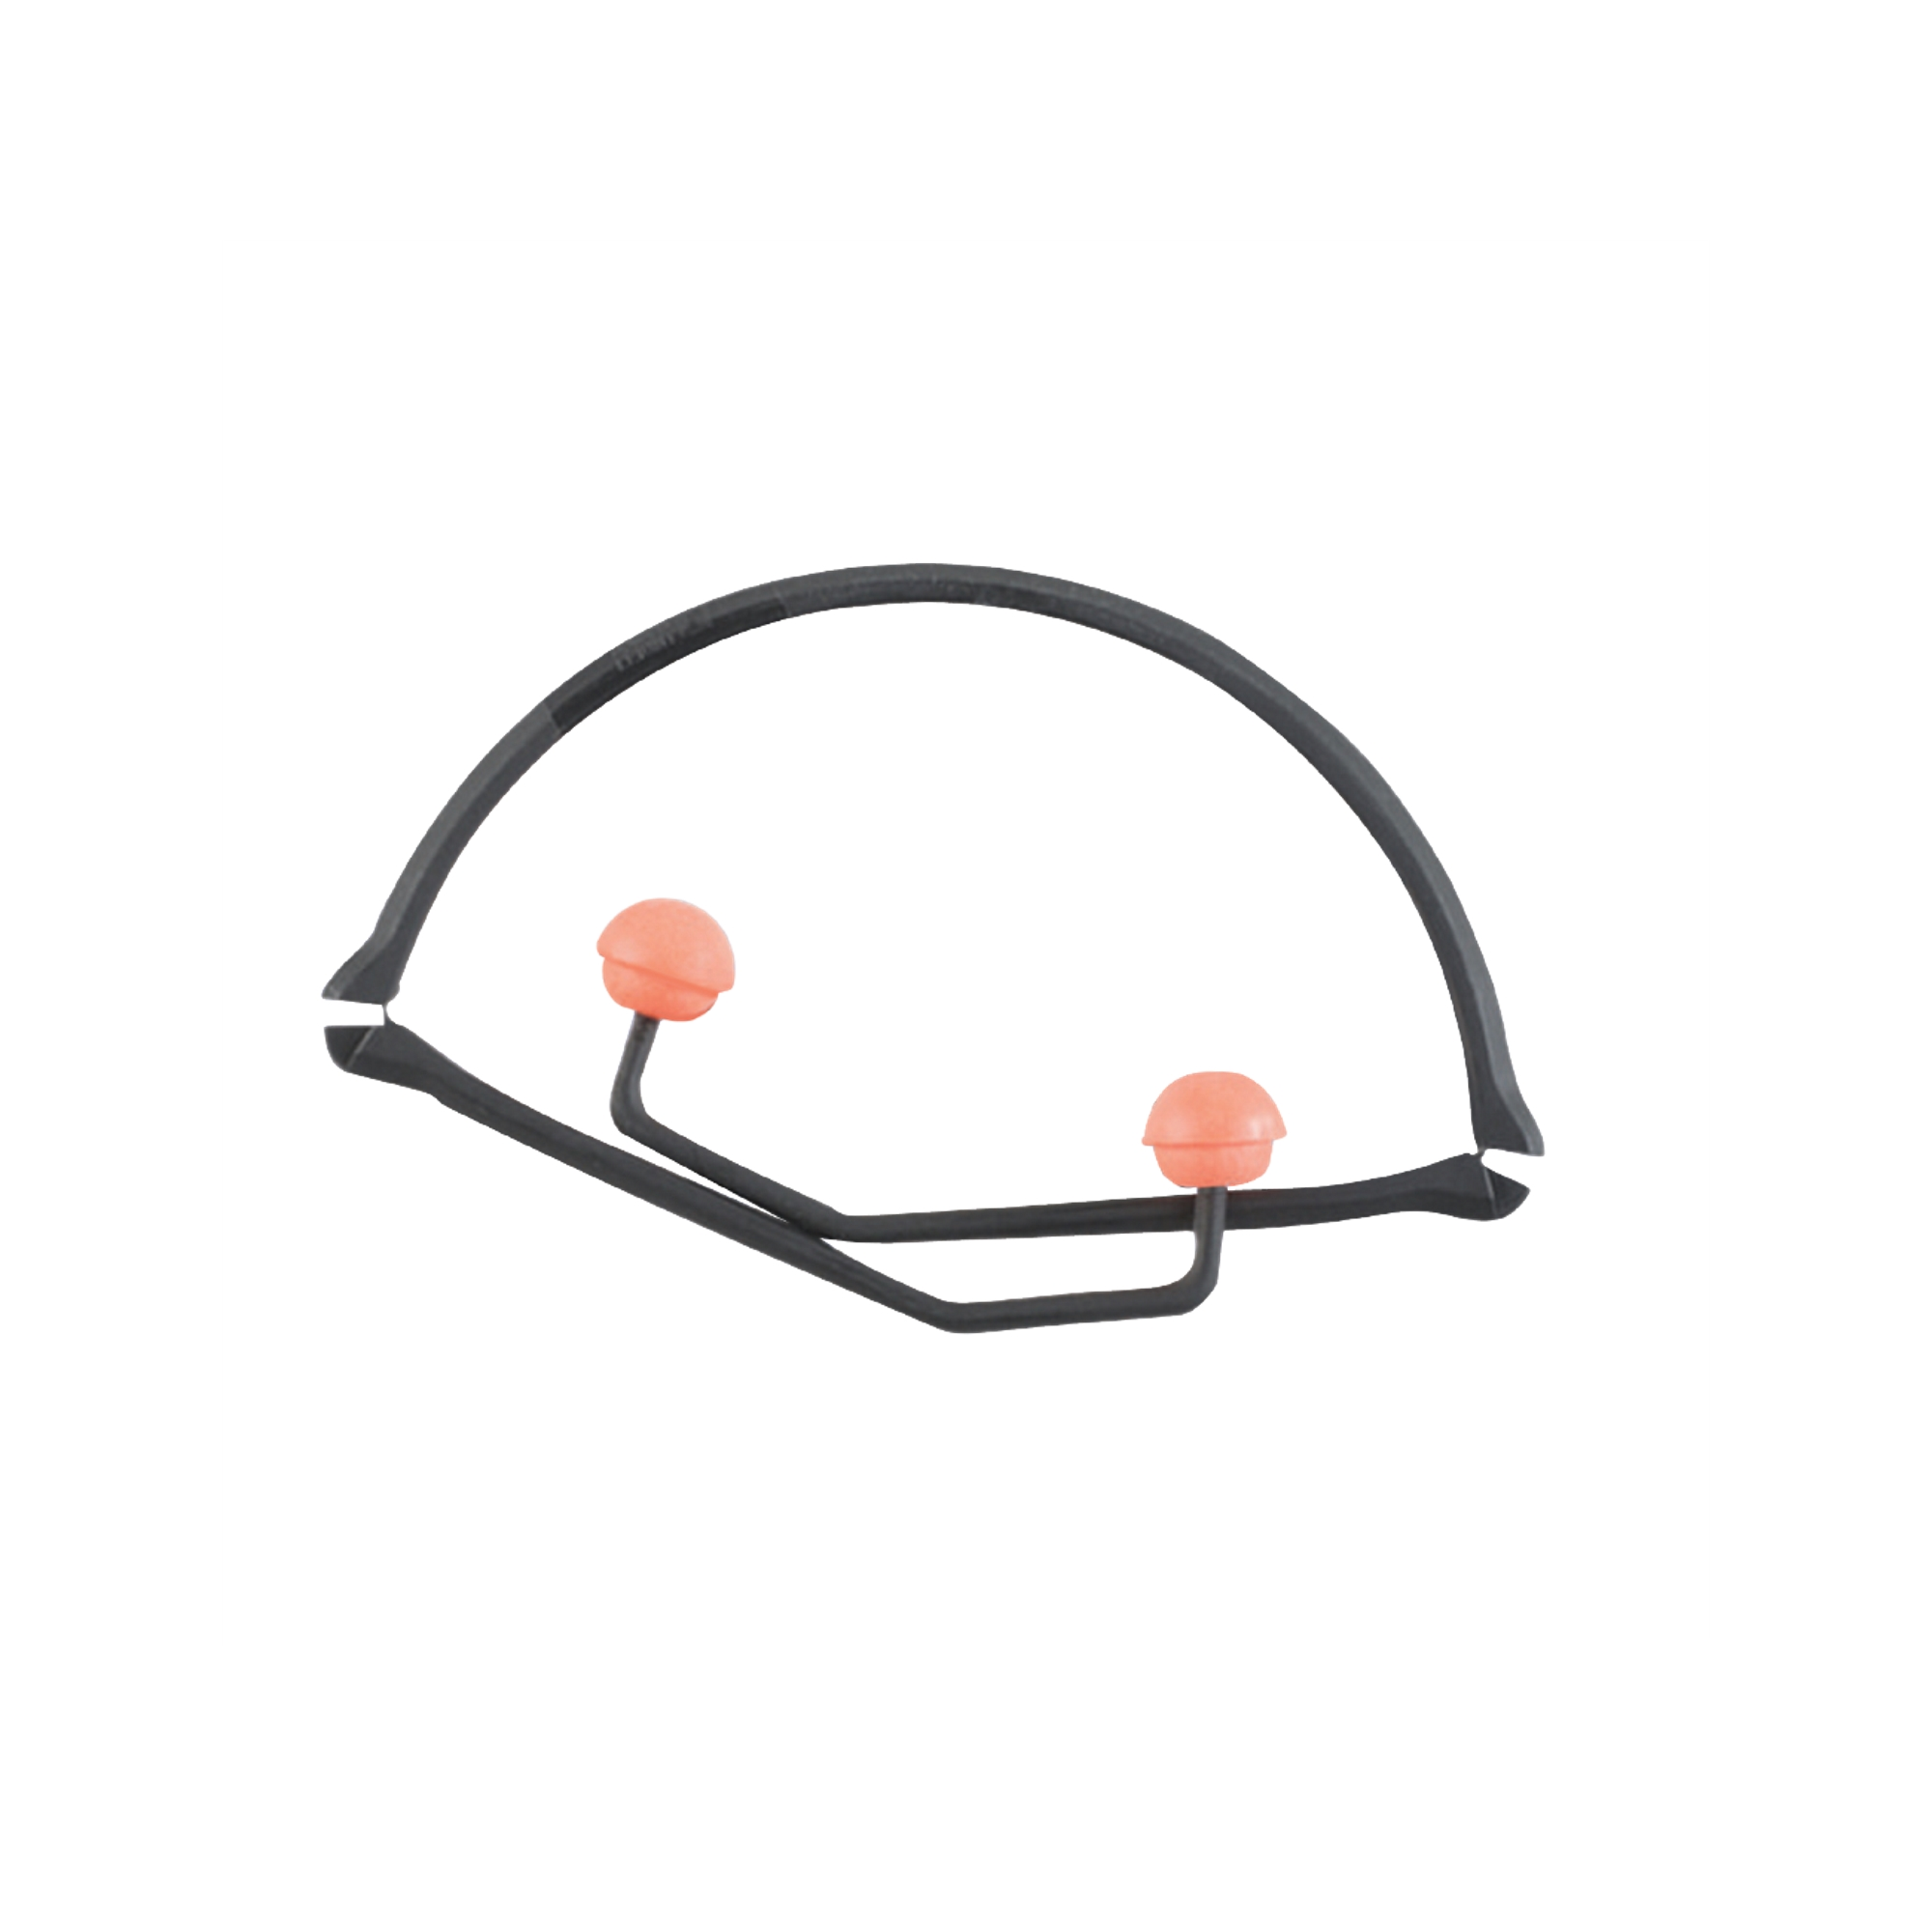 Wkładki ochronne słuchu PerCap® - model składany